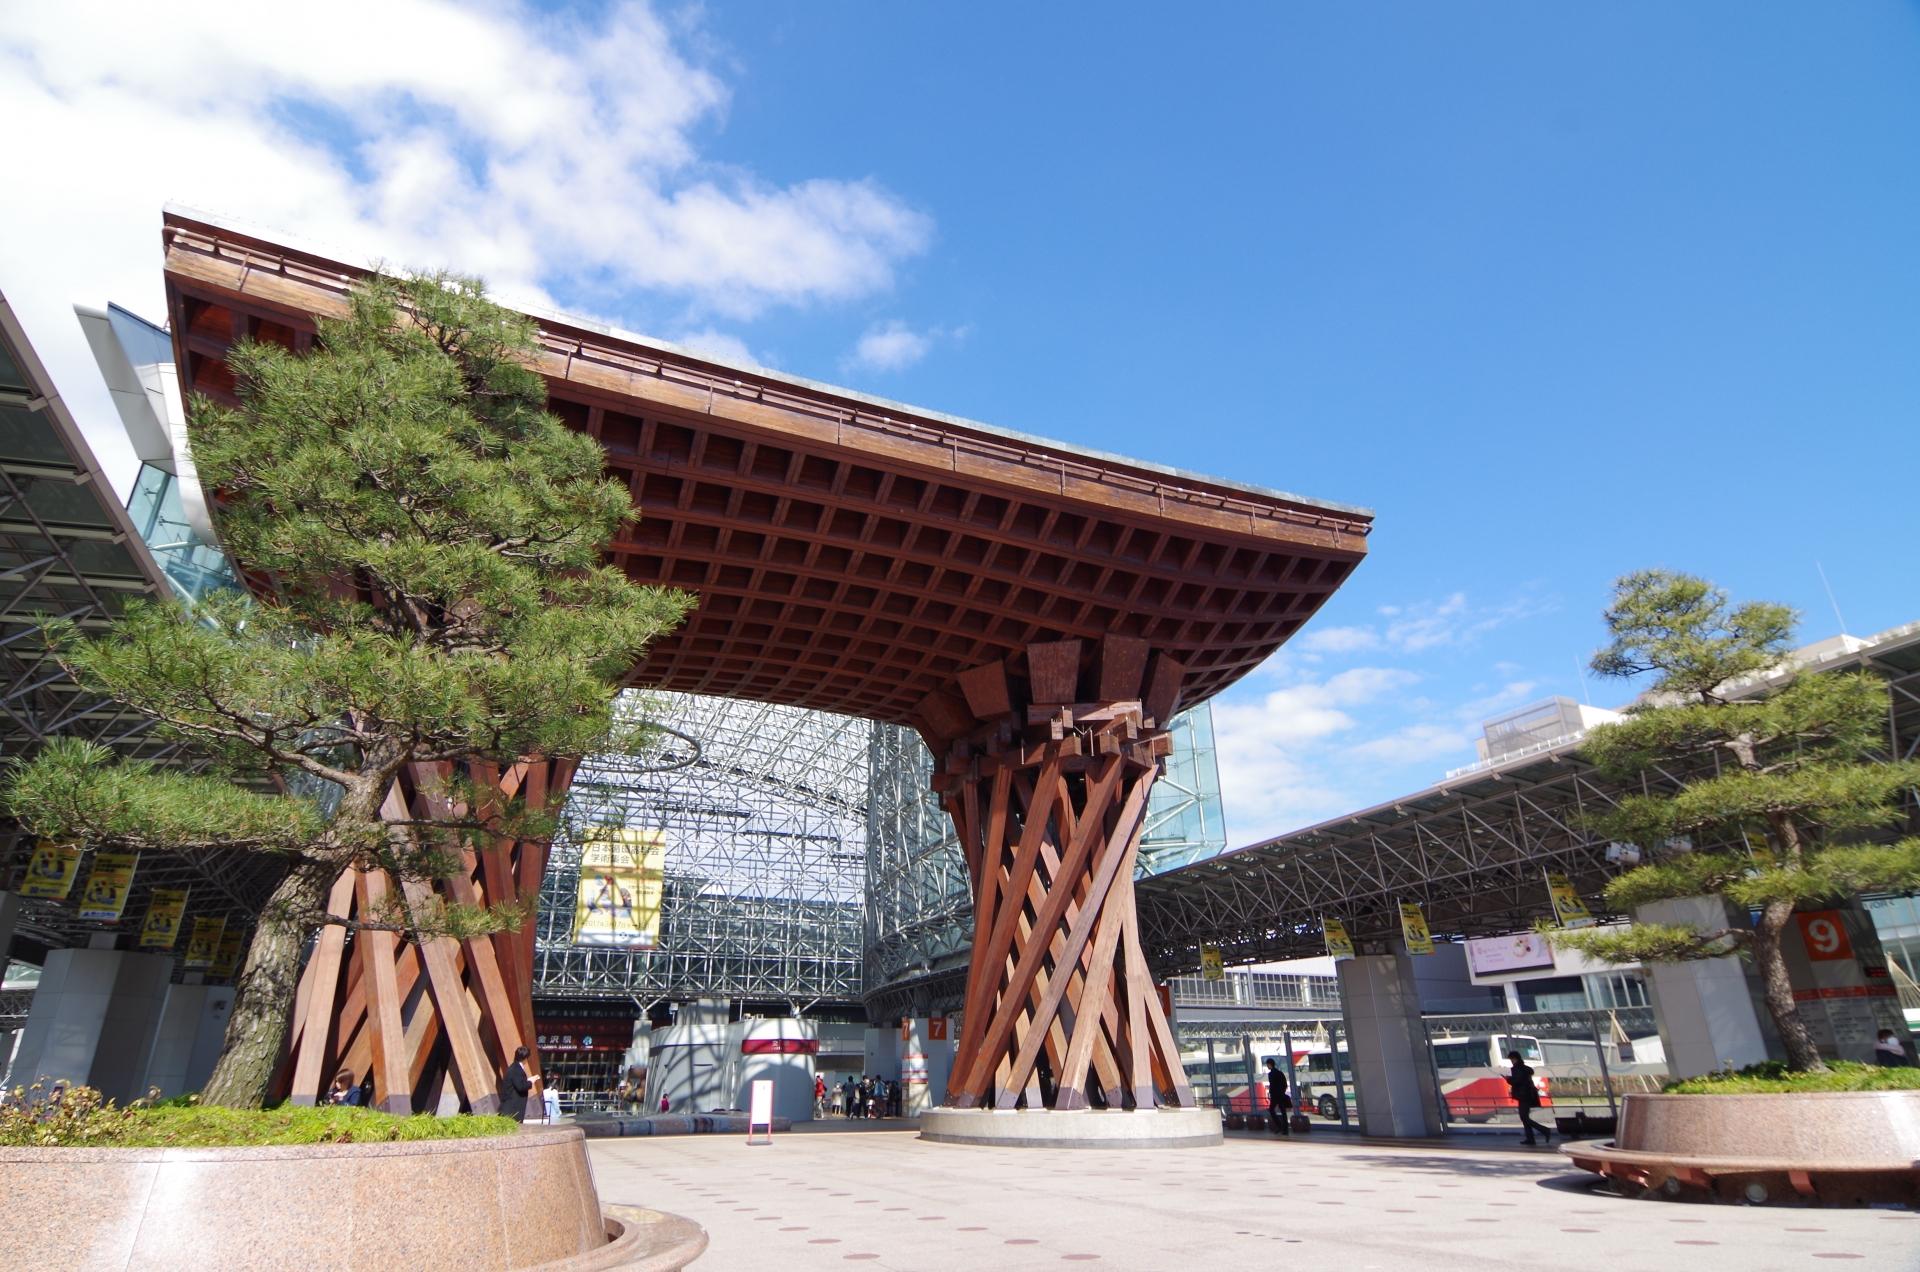 鼓門,金沢駅,観光スポット,兼六園口,東口